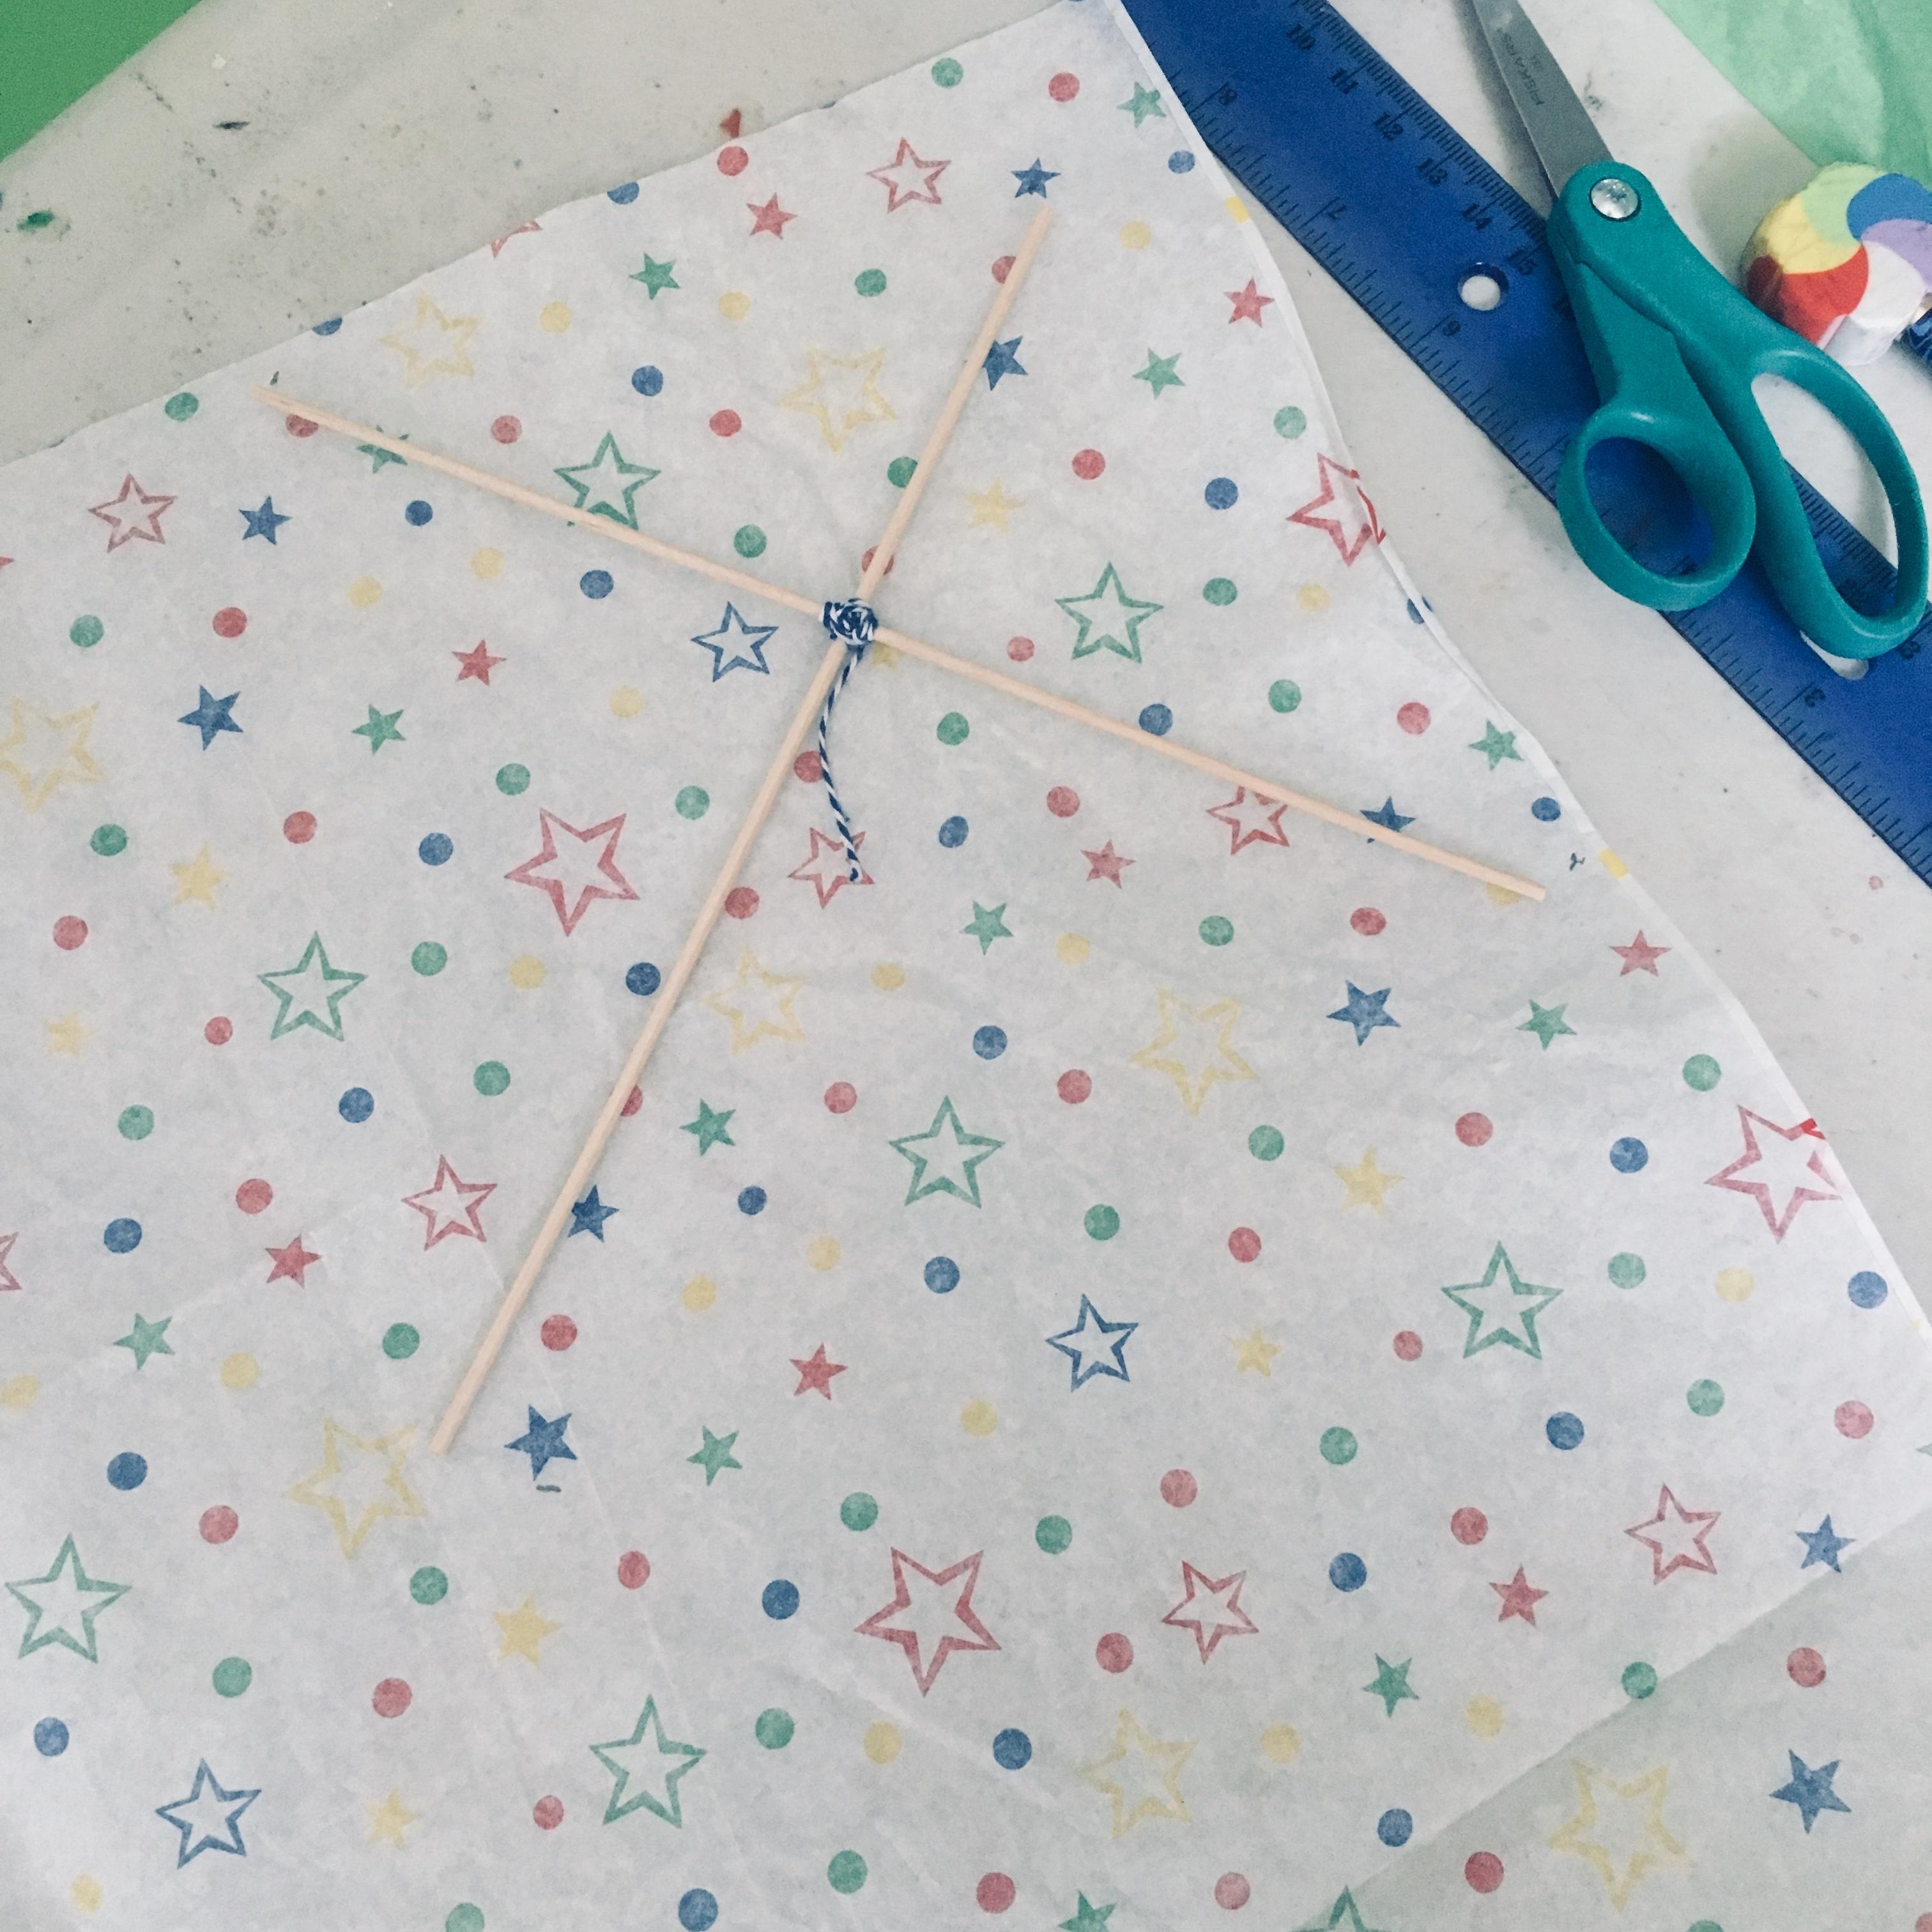 The Quarreling Kites - Fil-Am Learners